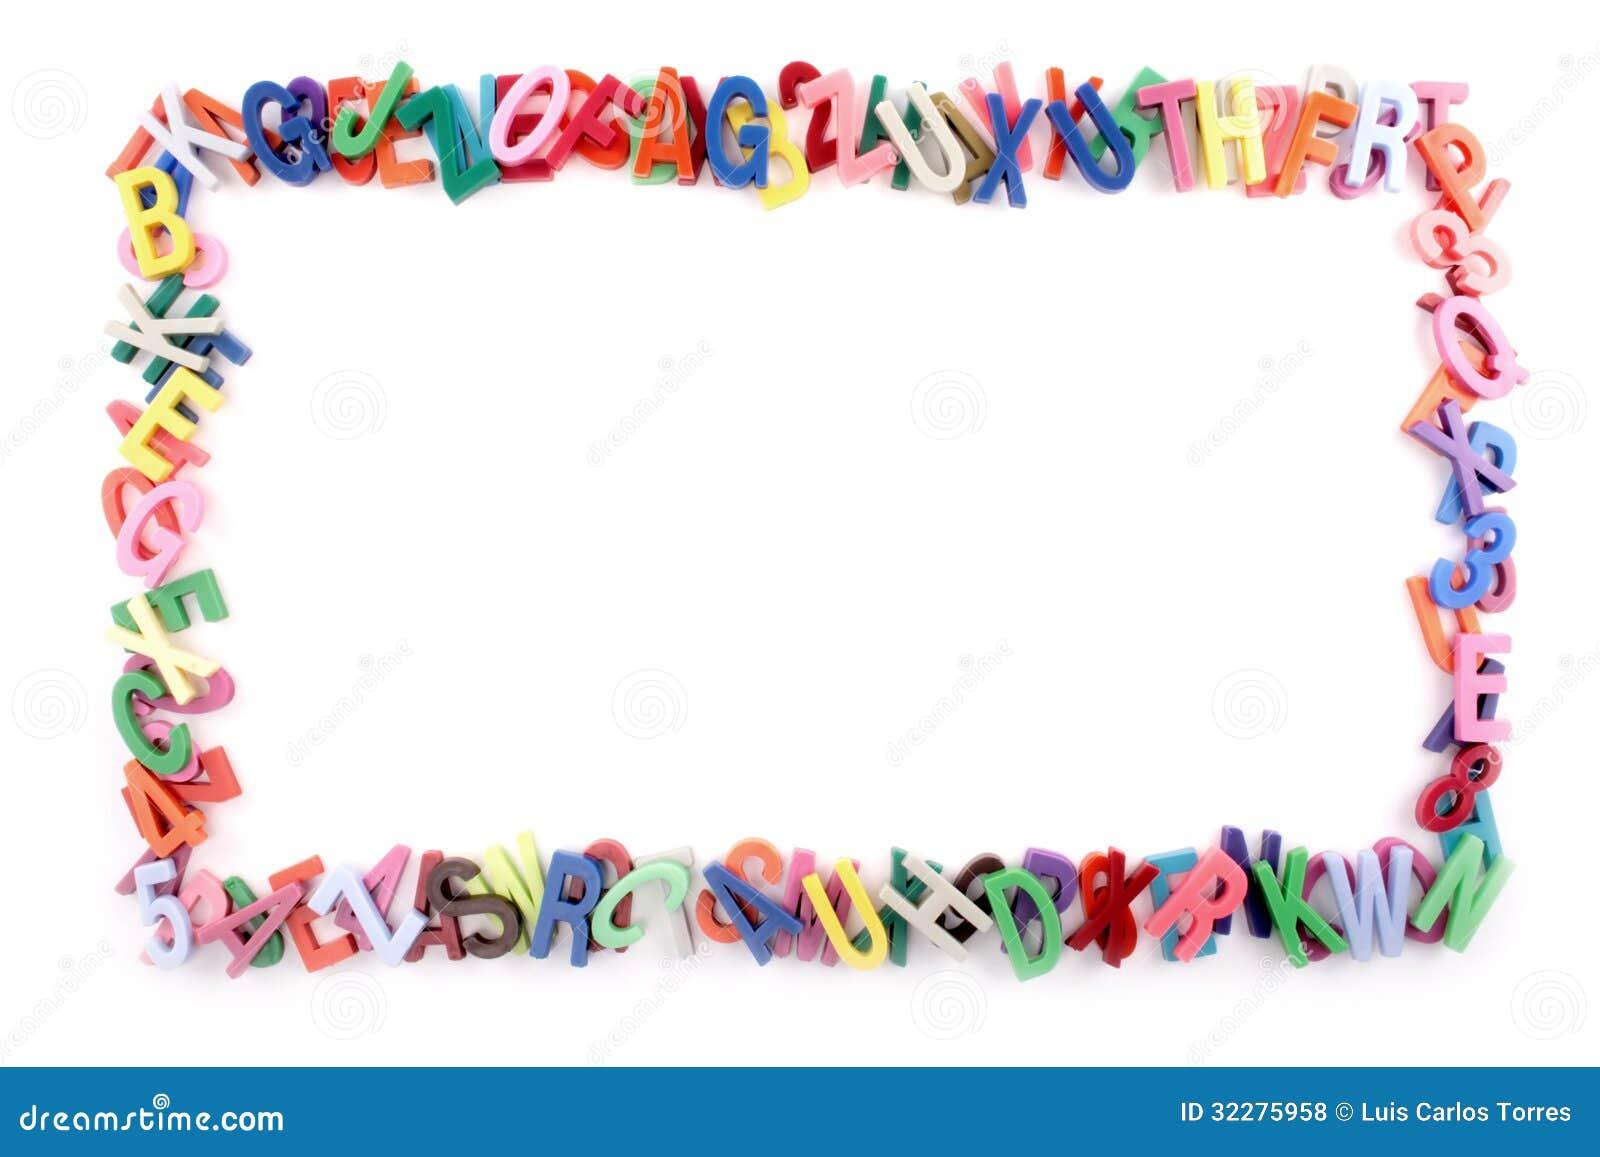 Alphabet Frame Royalty Free Stock Photos - Image: 32275958